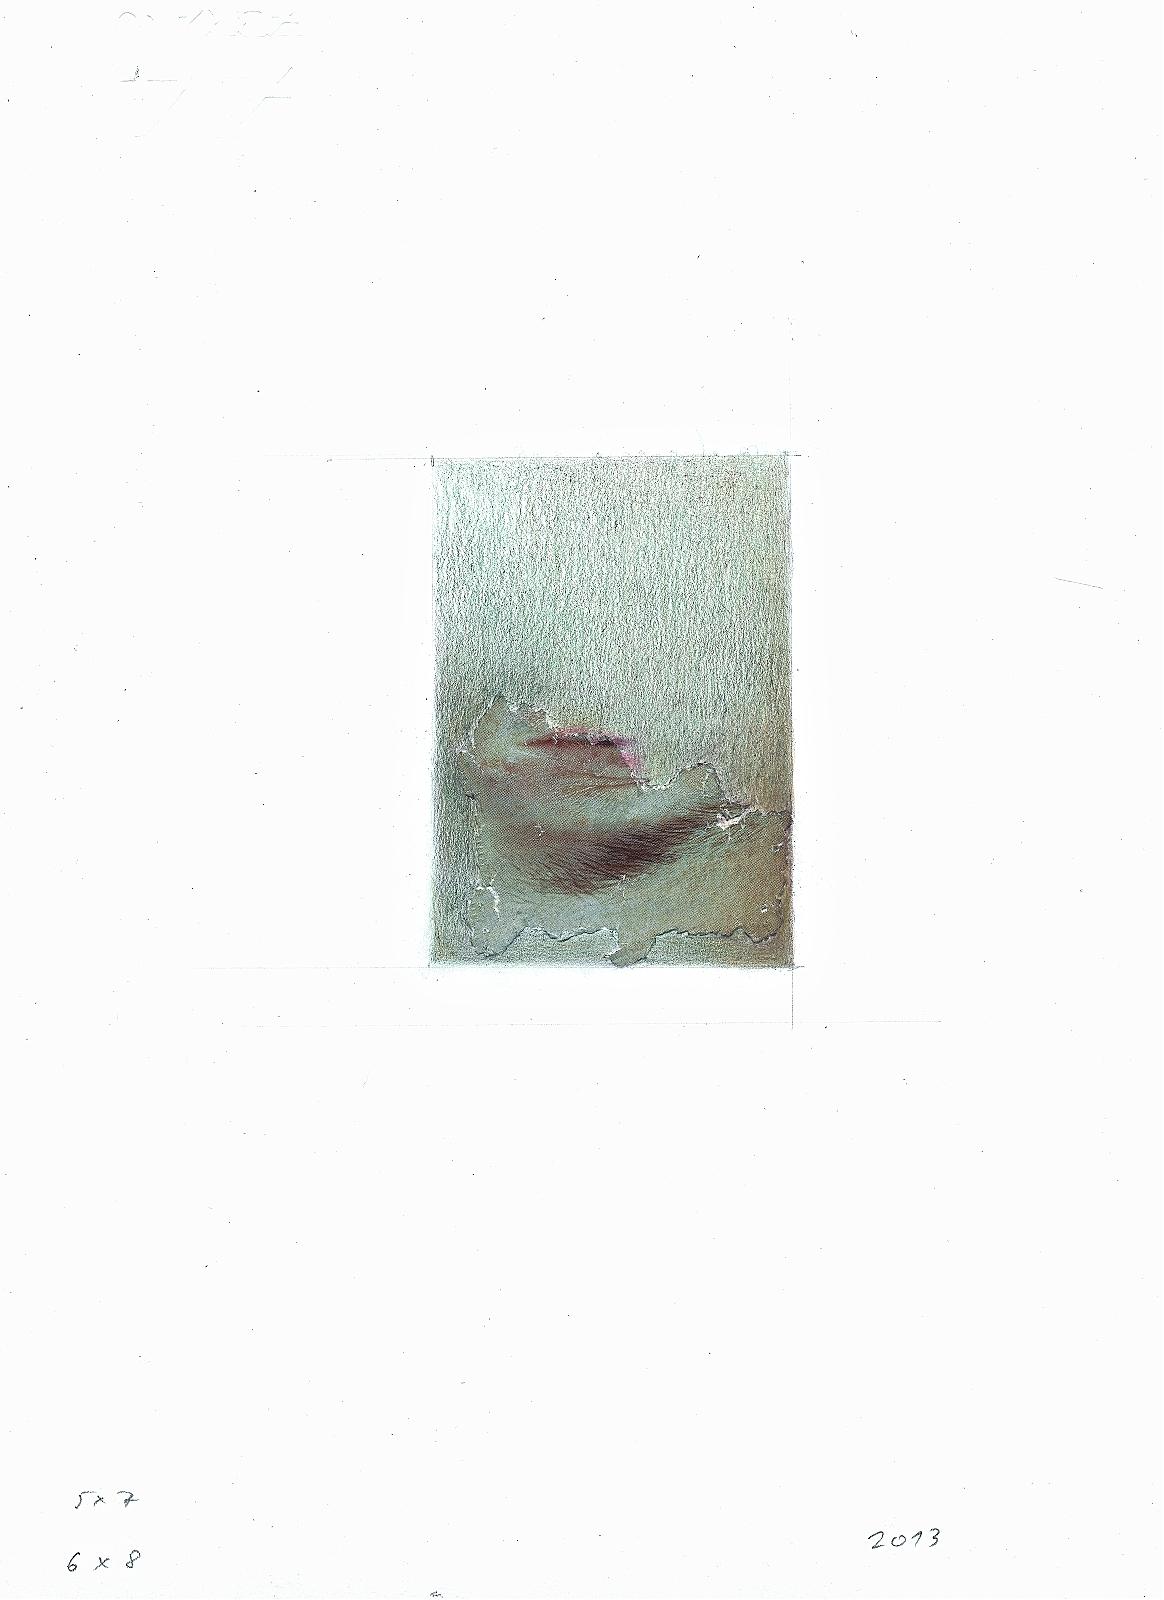 """Ancient II"", 2013, pencil, collage, 16.5 x 24 cm"